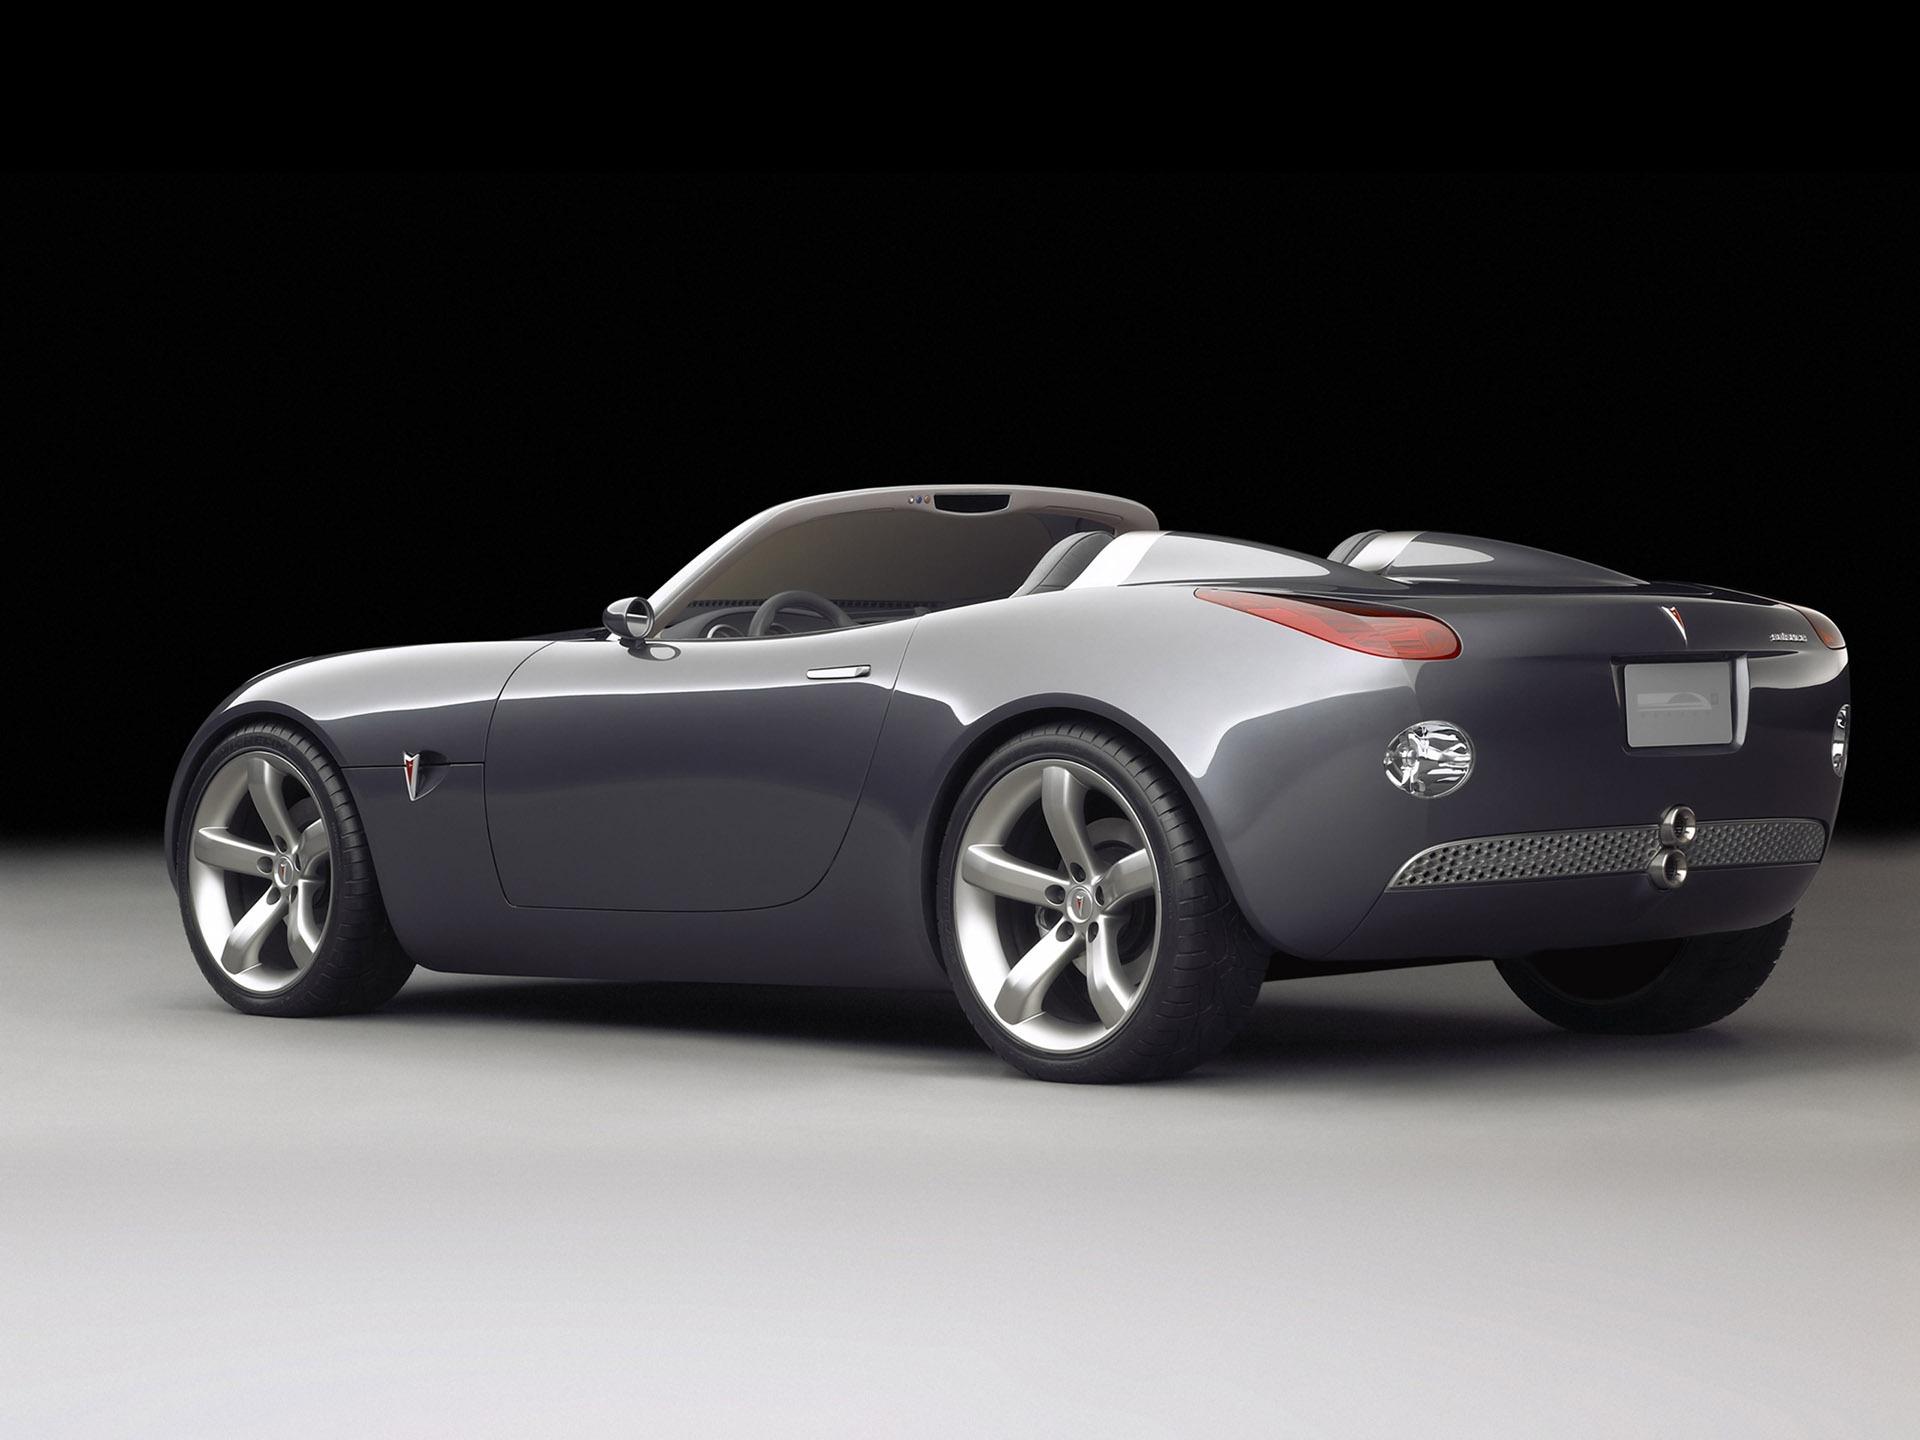 Pontiac Solstice Concept (2002) – Old Concept Cars